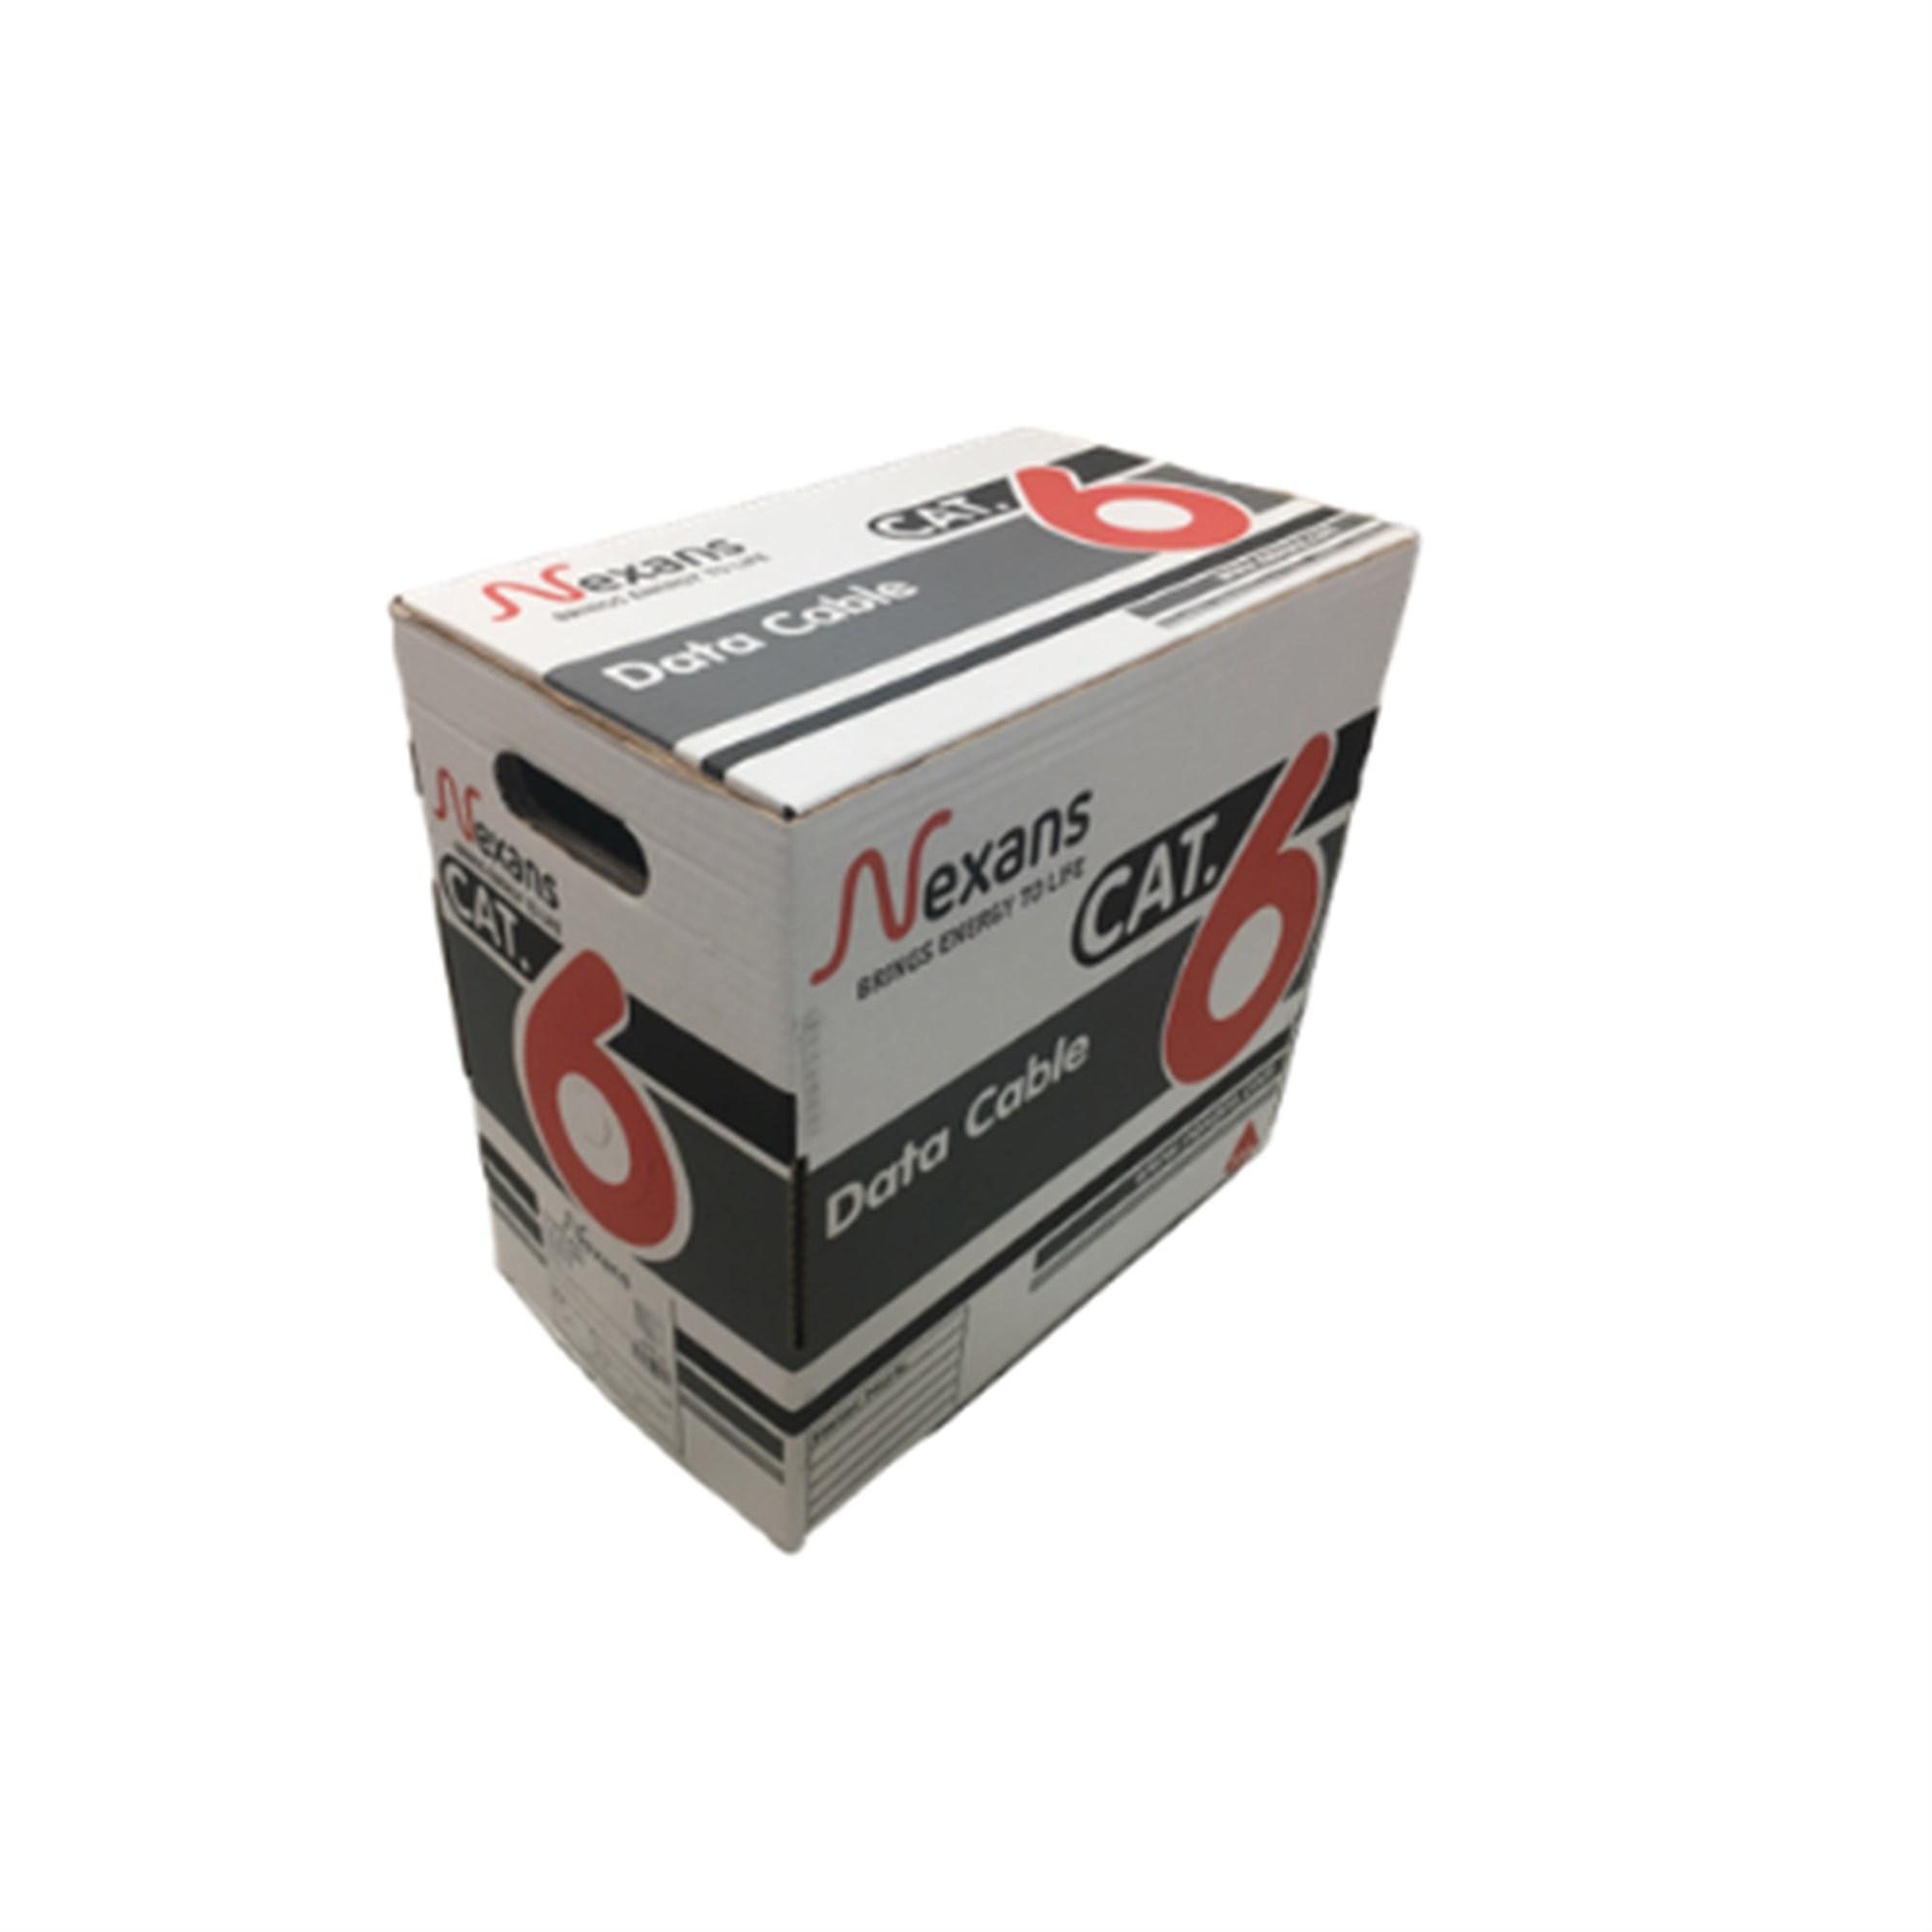 NEXANS 305 MT U / UTP PVC 23AWG CAT 6 100% COPPER NETWORK CABLE